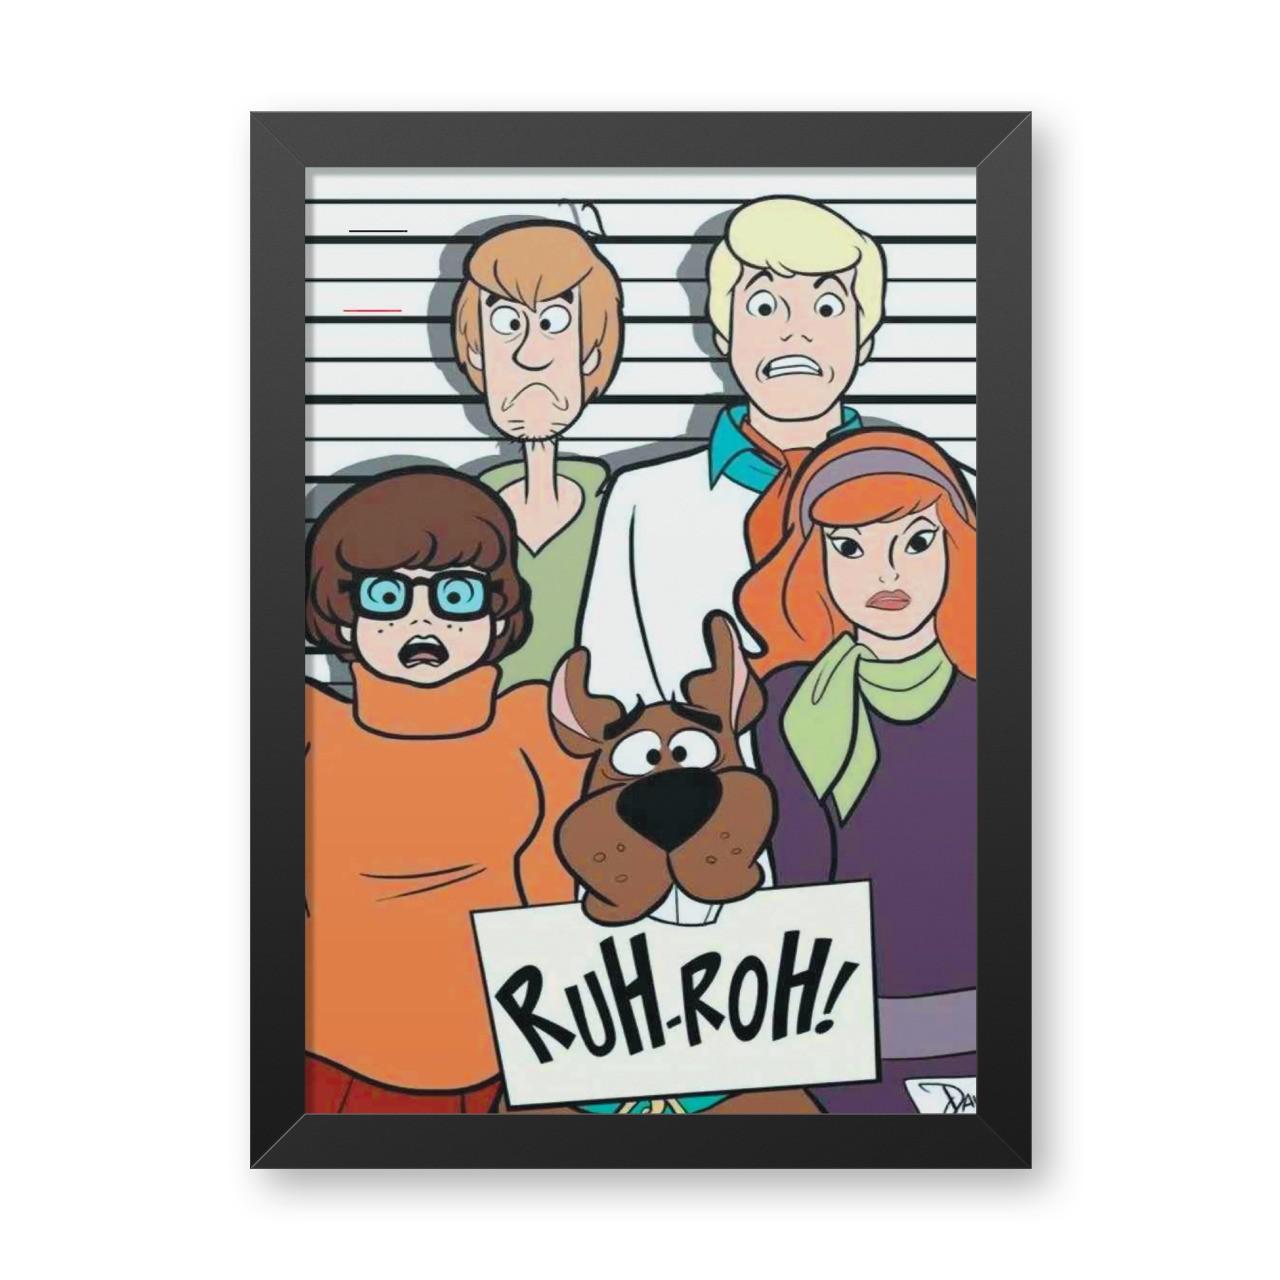 Quadro Com Moldura: Turma Scooby Doo ''Ruh-Roh!'' (Scooby Doo) - 46x33